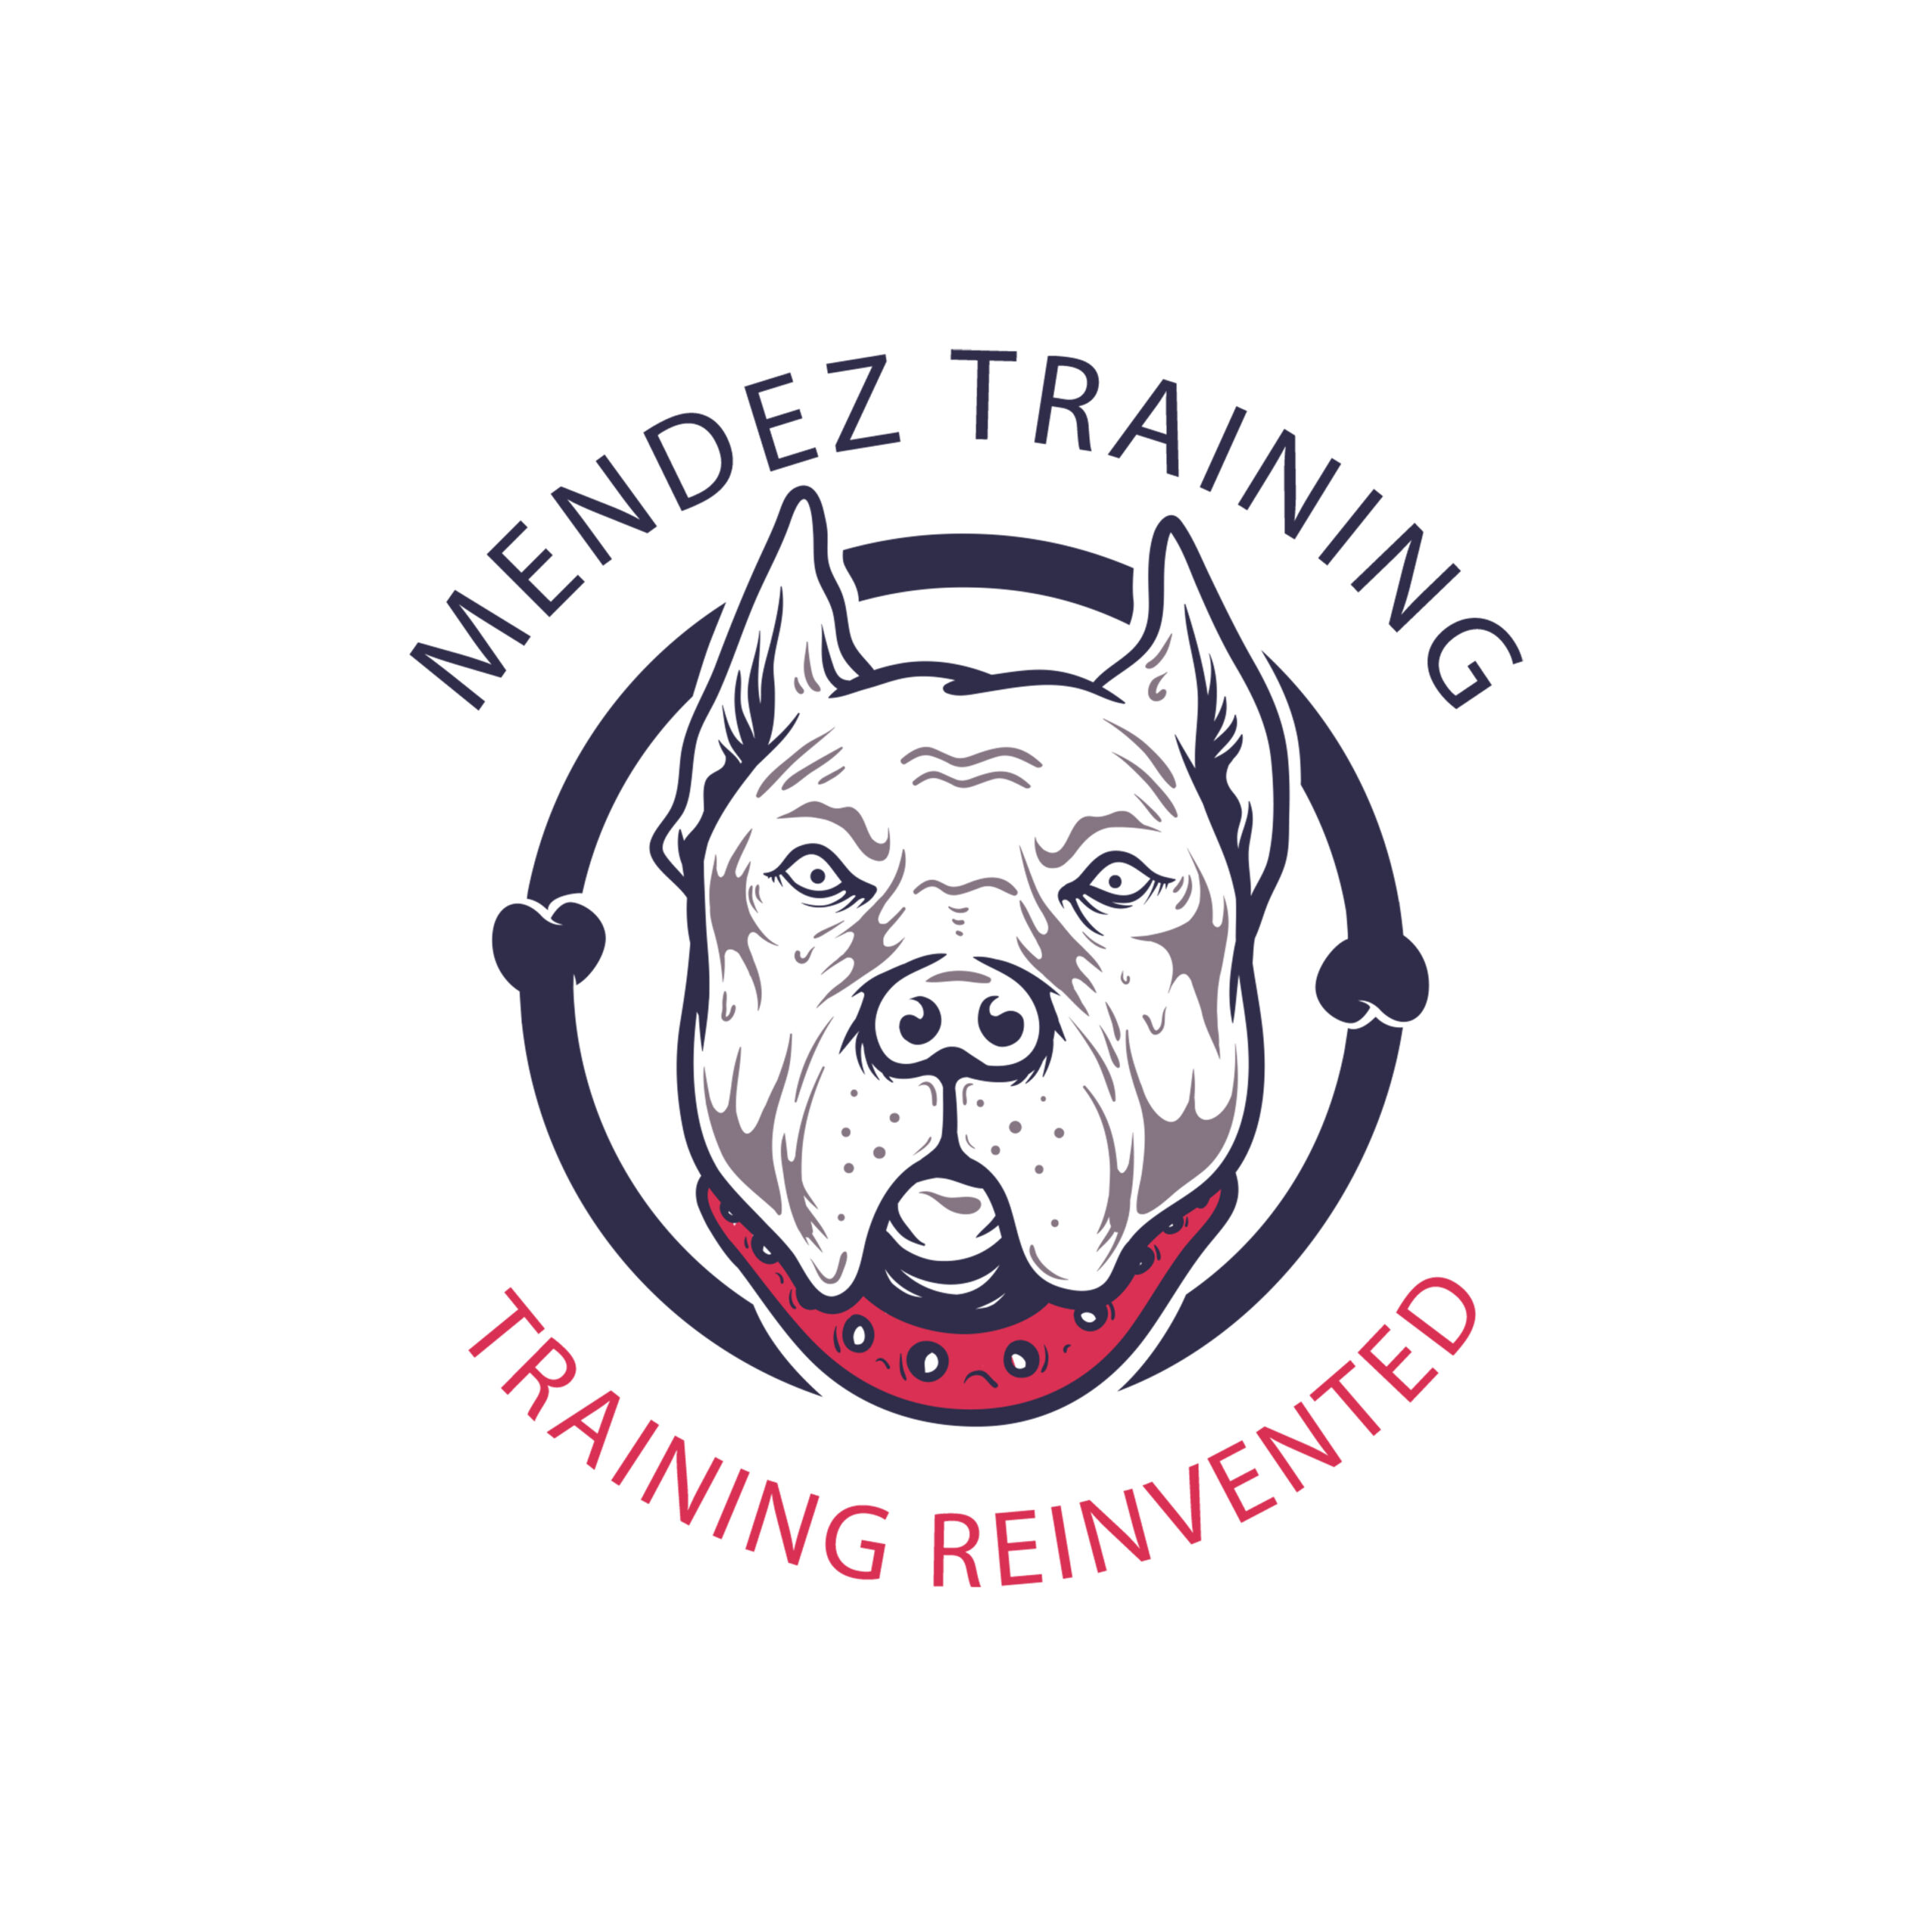 MENDEZ TRAINING WEBSITE MASTER